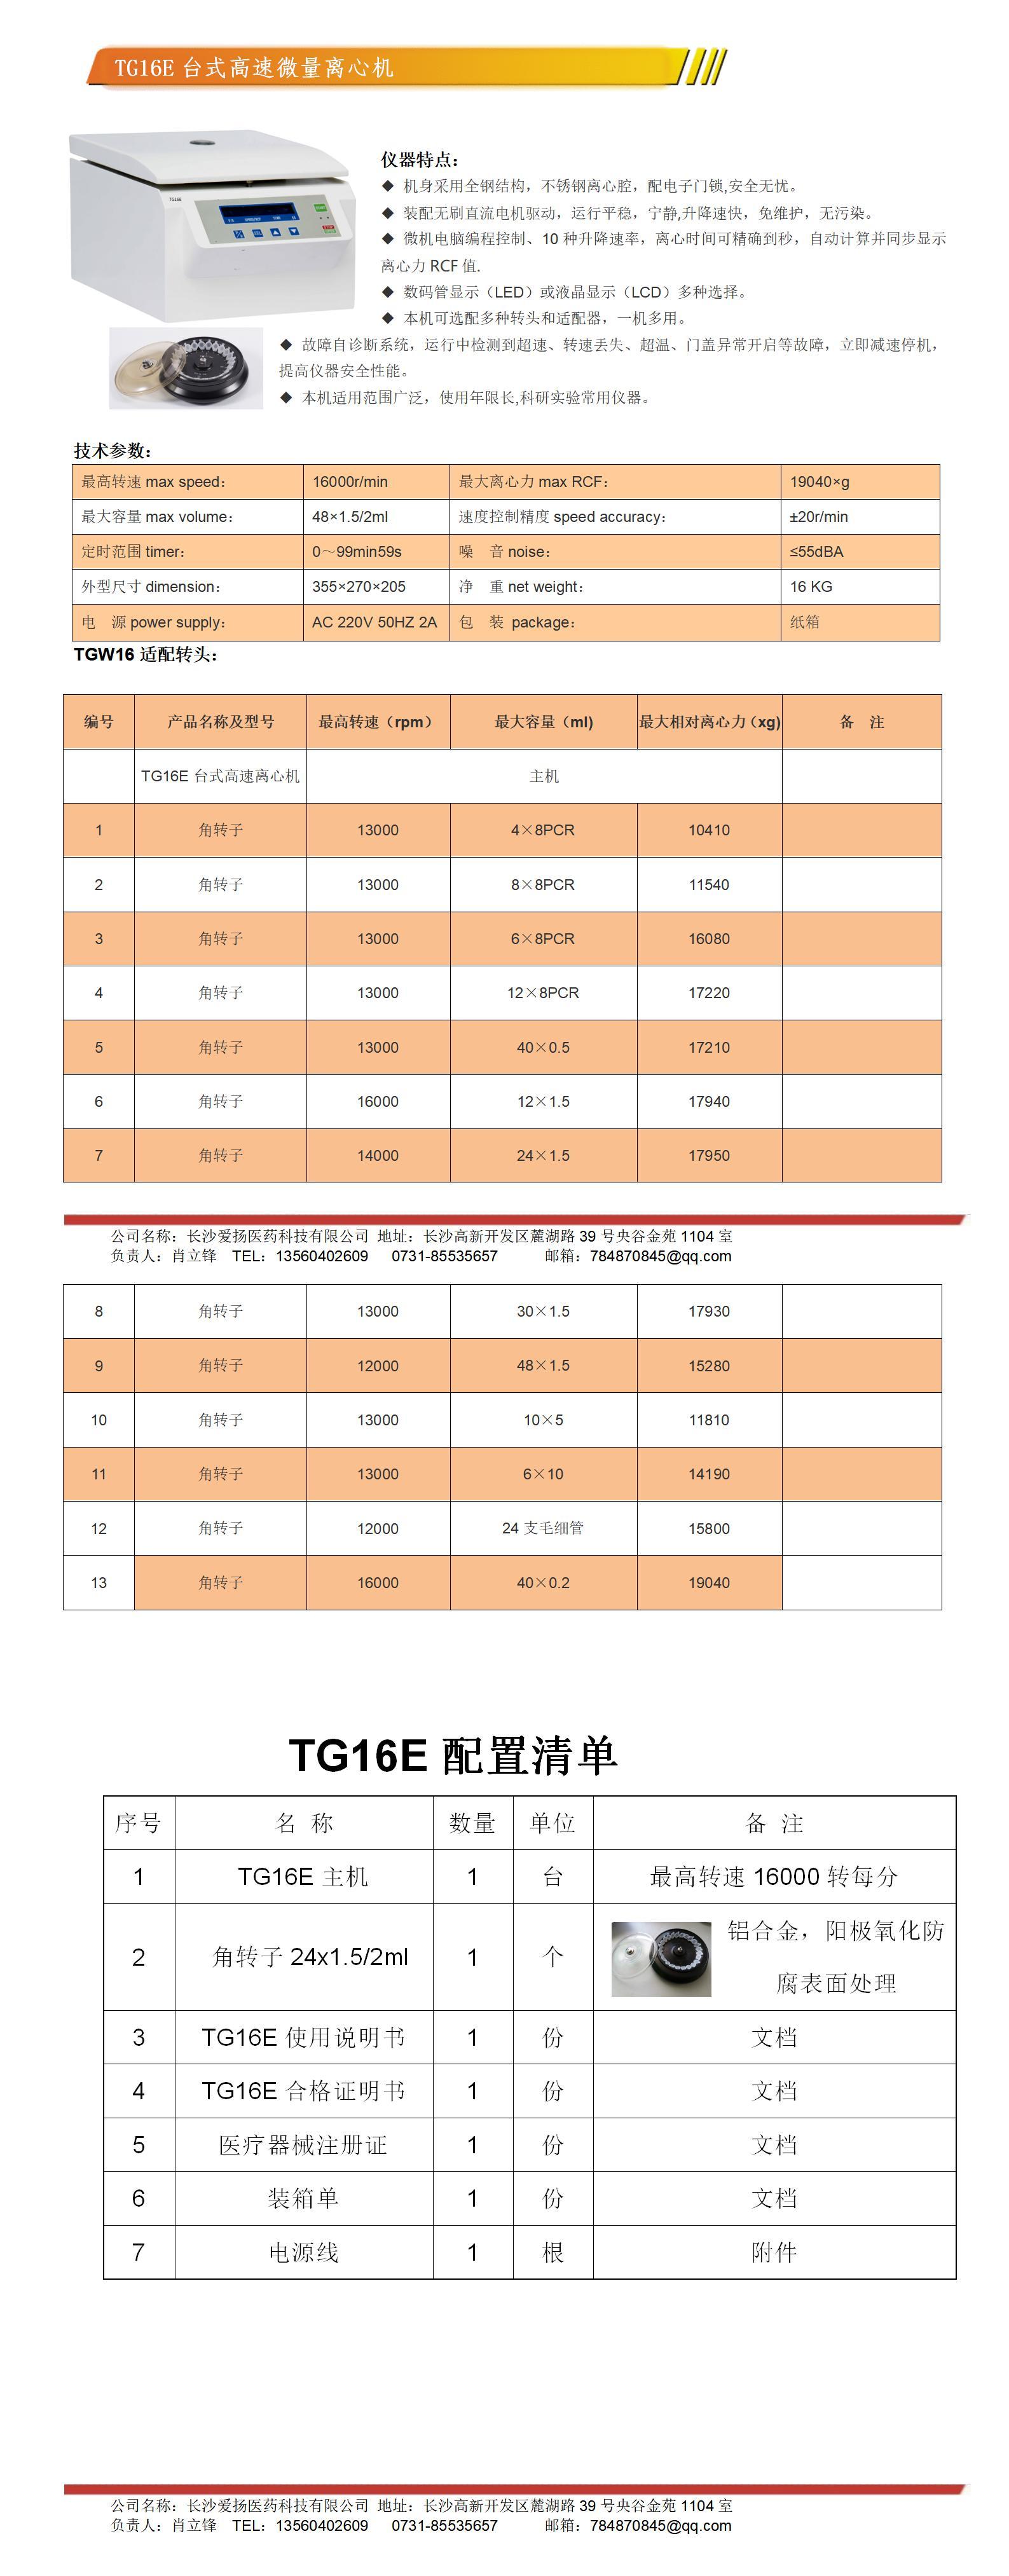 TG16E臺式高速離心機帶配置清單24x1.5ml - 副本.jpg